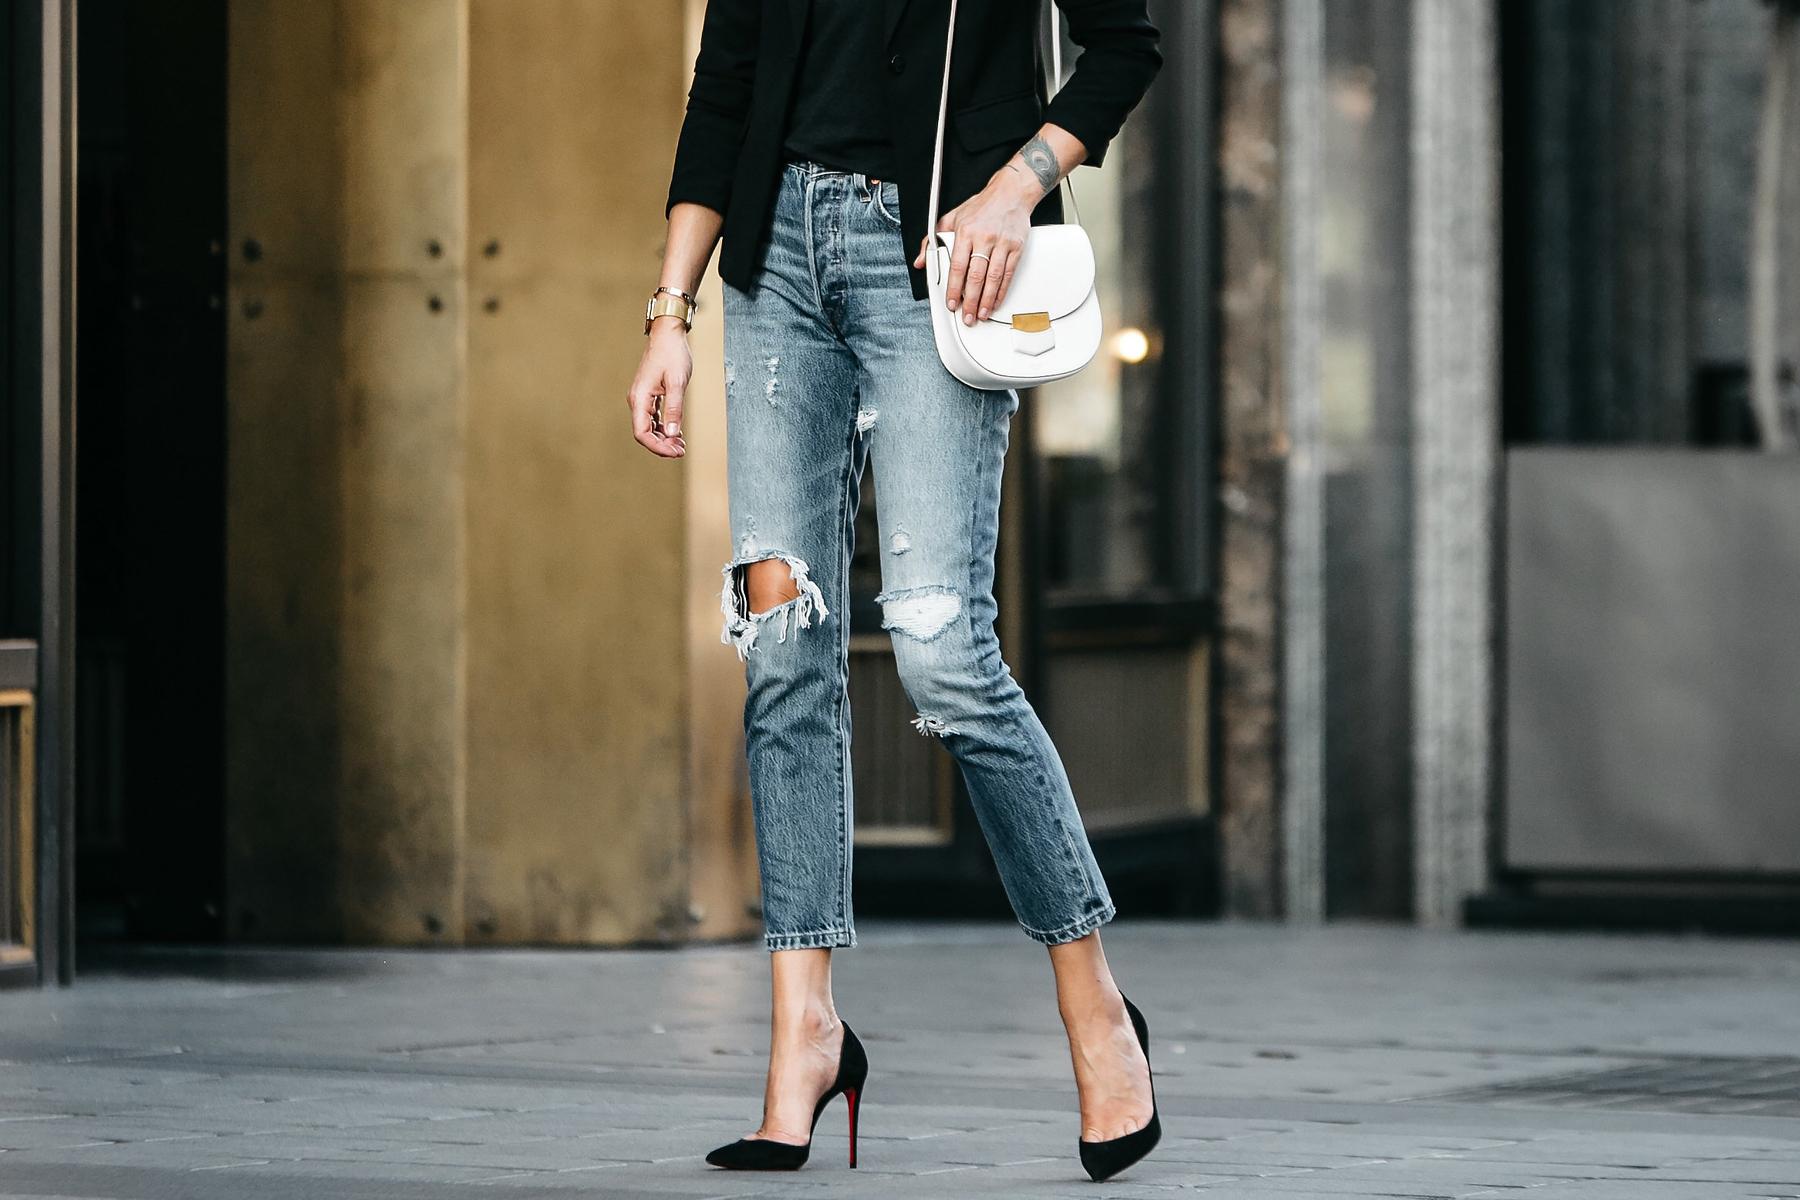 Levis Denim Ripped Jeans Celine Trotteur White Handbag Christian Louboutin Black Pumps Fashion Jackson Dallas Blogger Fashion Blogger Street Style